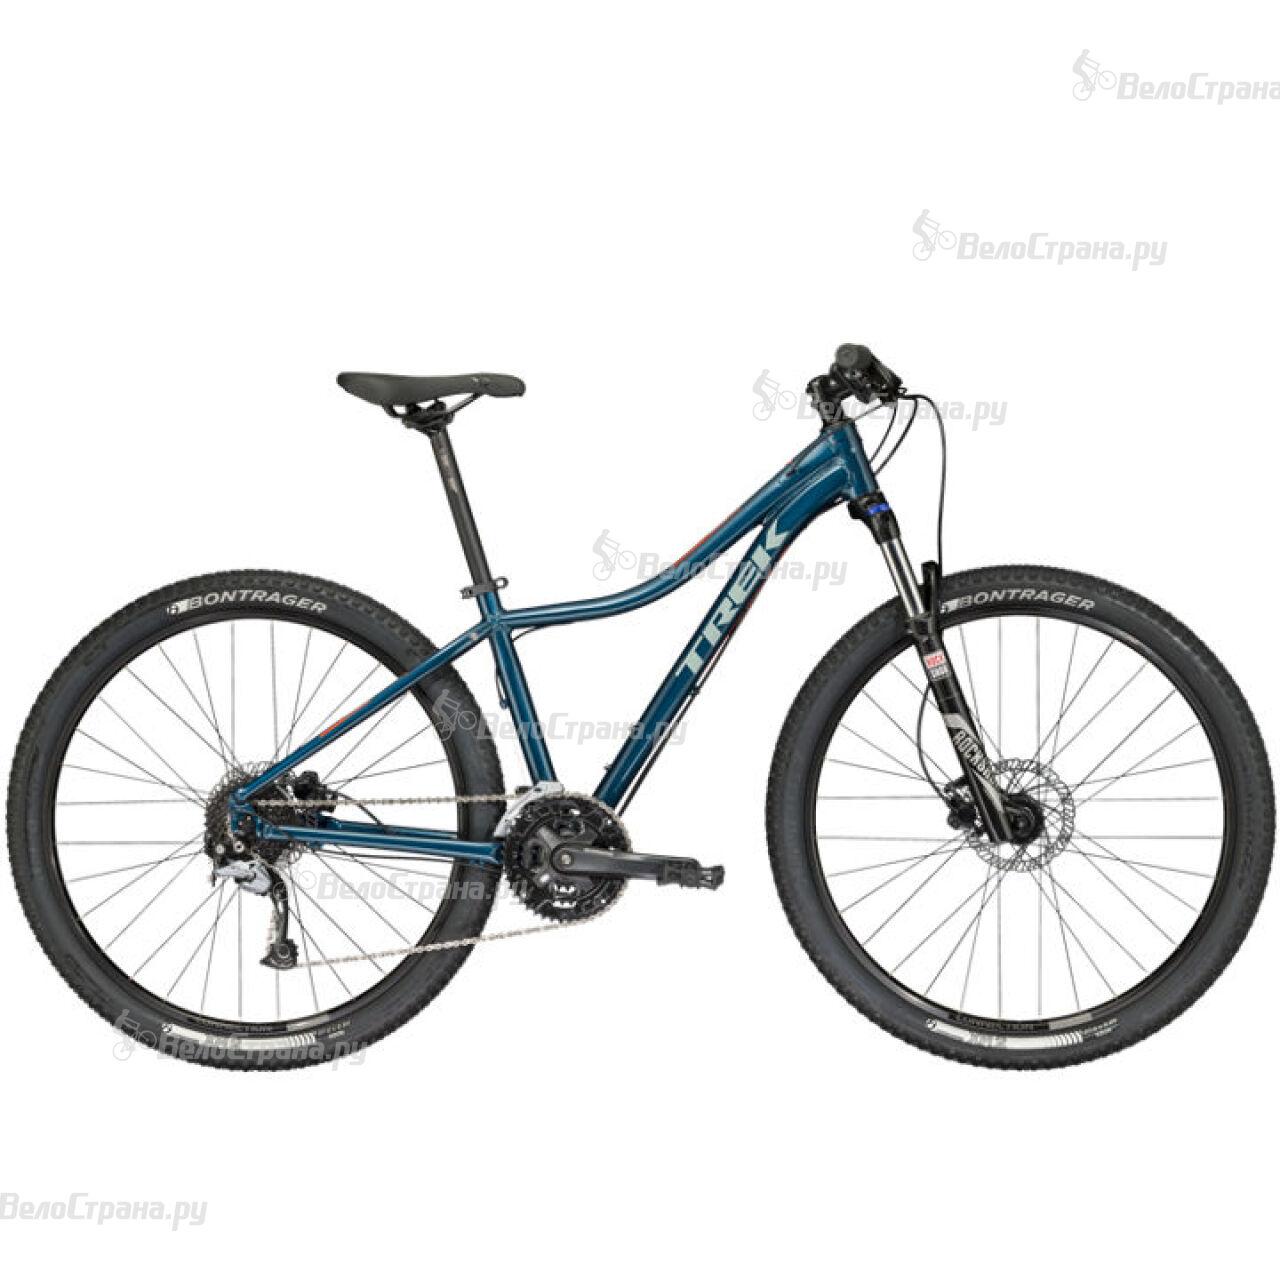 Велосипед Trek Cali S WSD 27,5 (2017) велосипед trek lush s 27 5 2015